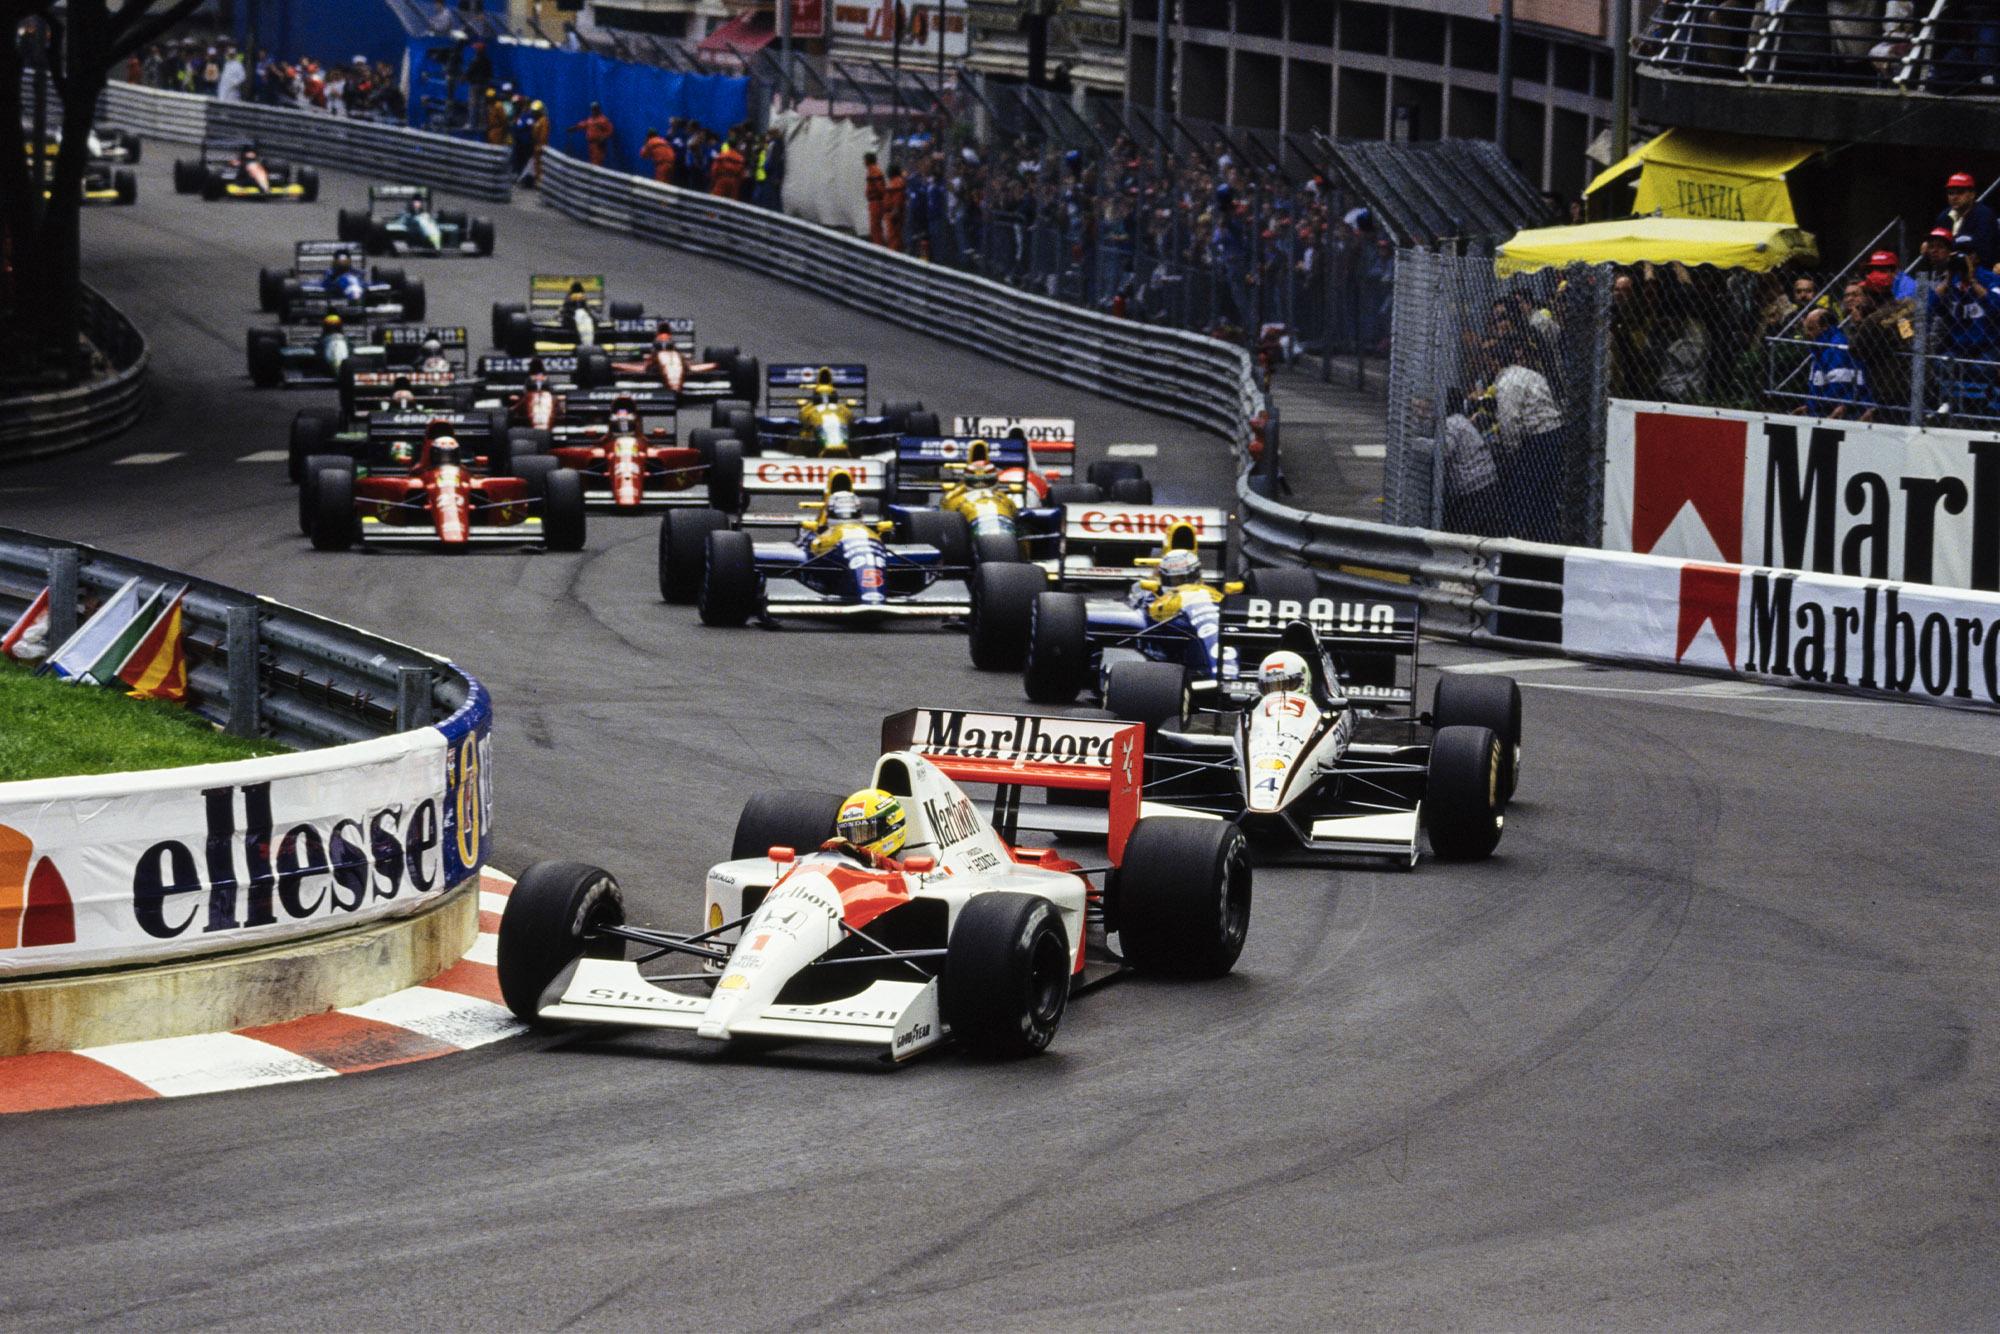 Monaco91Start